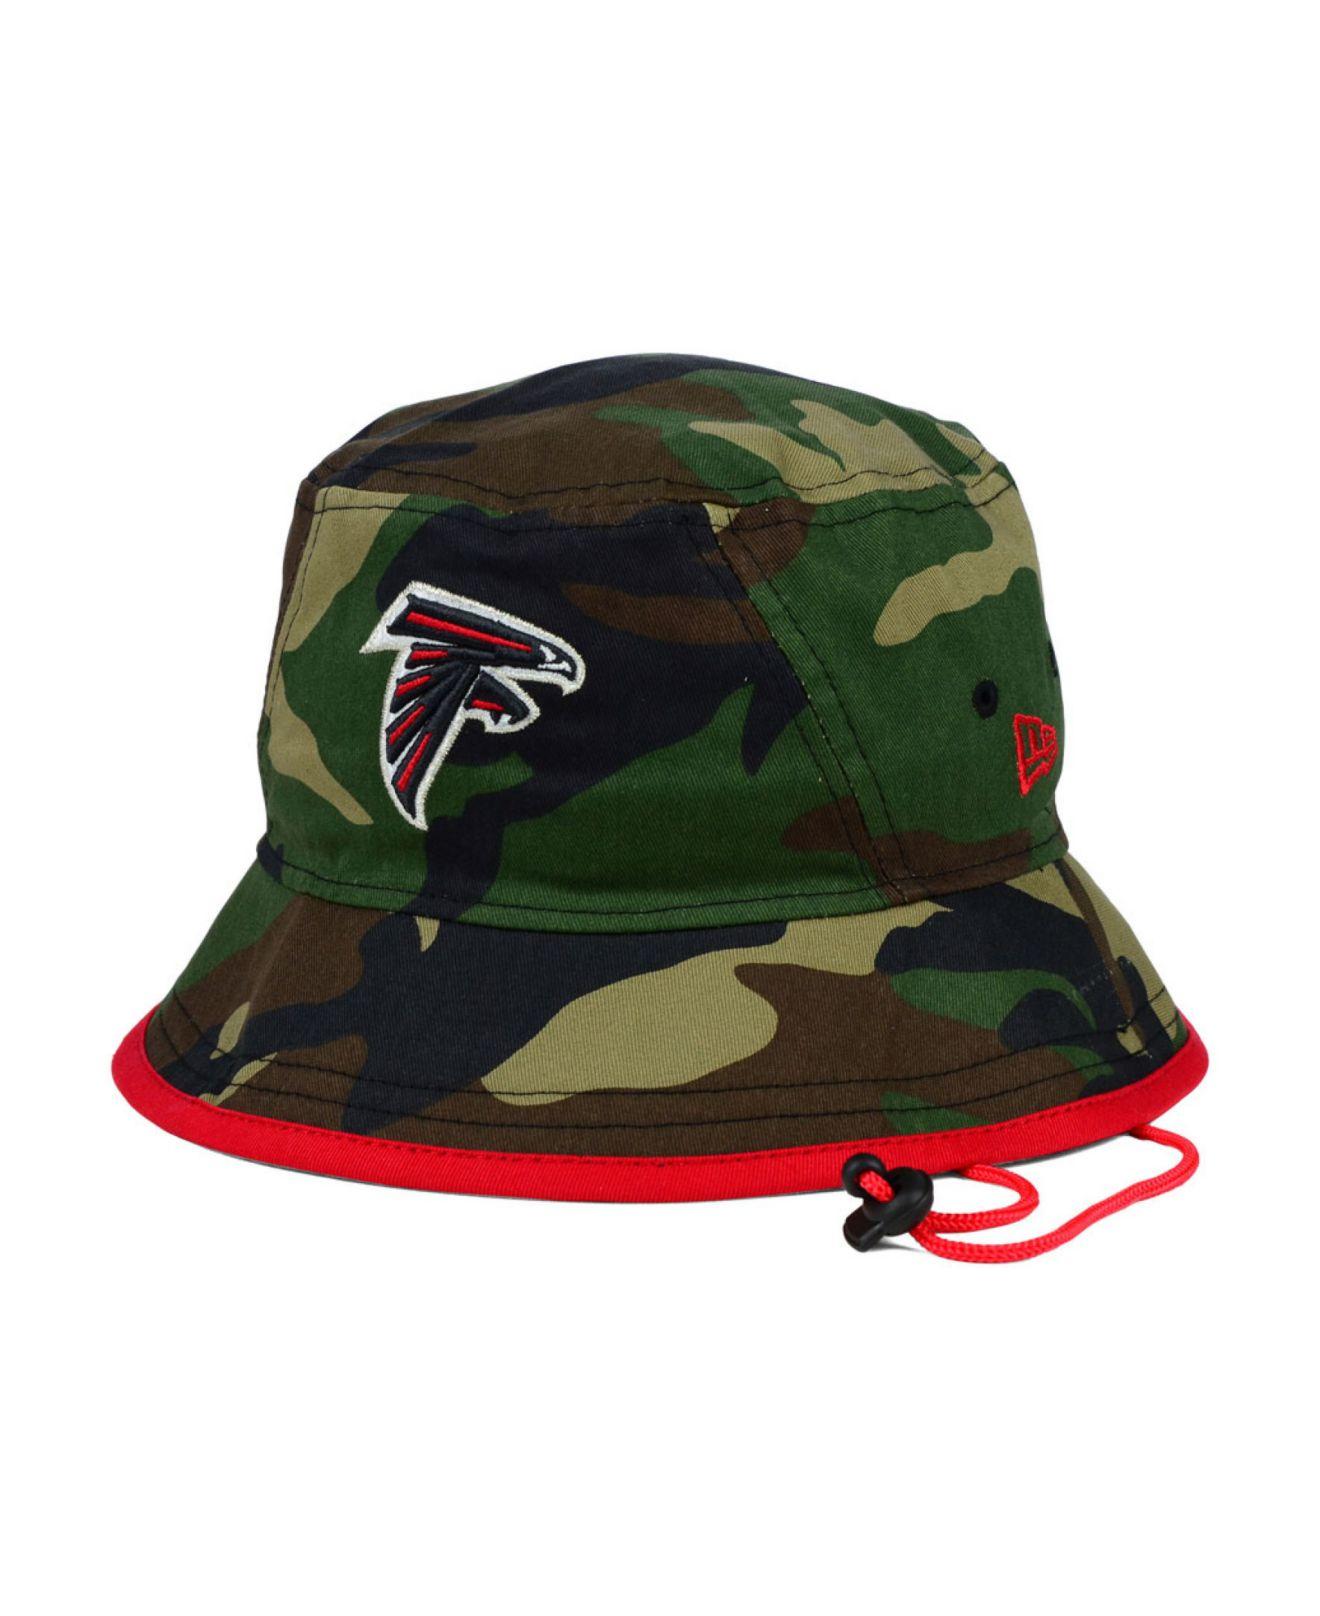 Lyst Ktz Atlanta Falcons O Pop Bucket Hat In Green For Men 441804770283